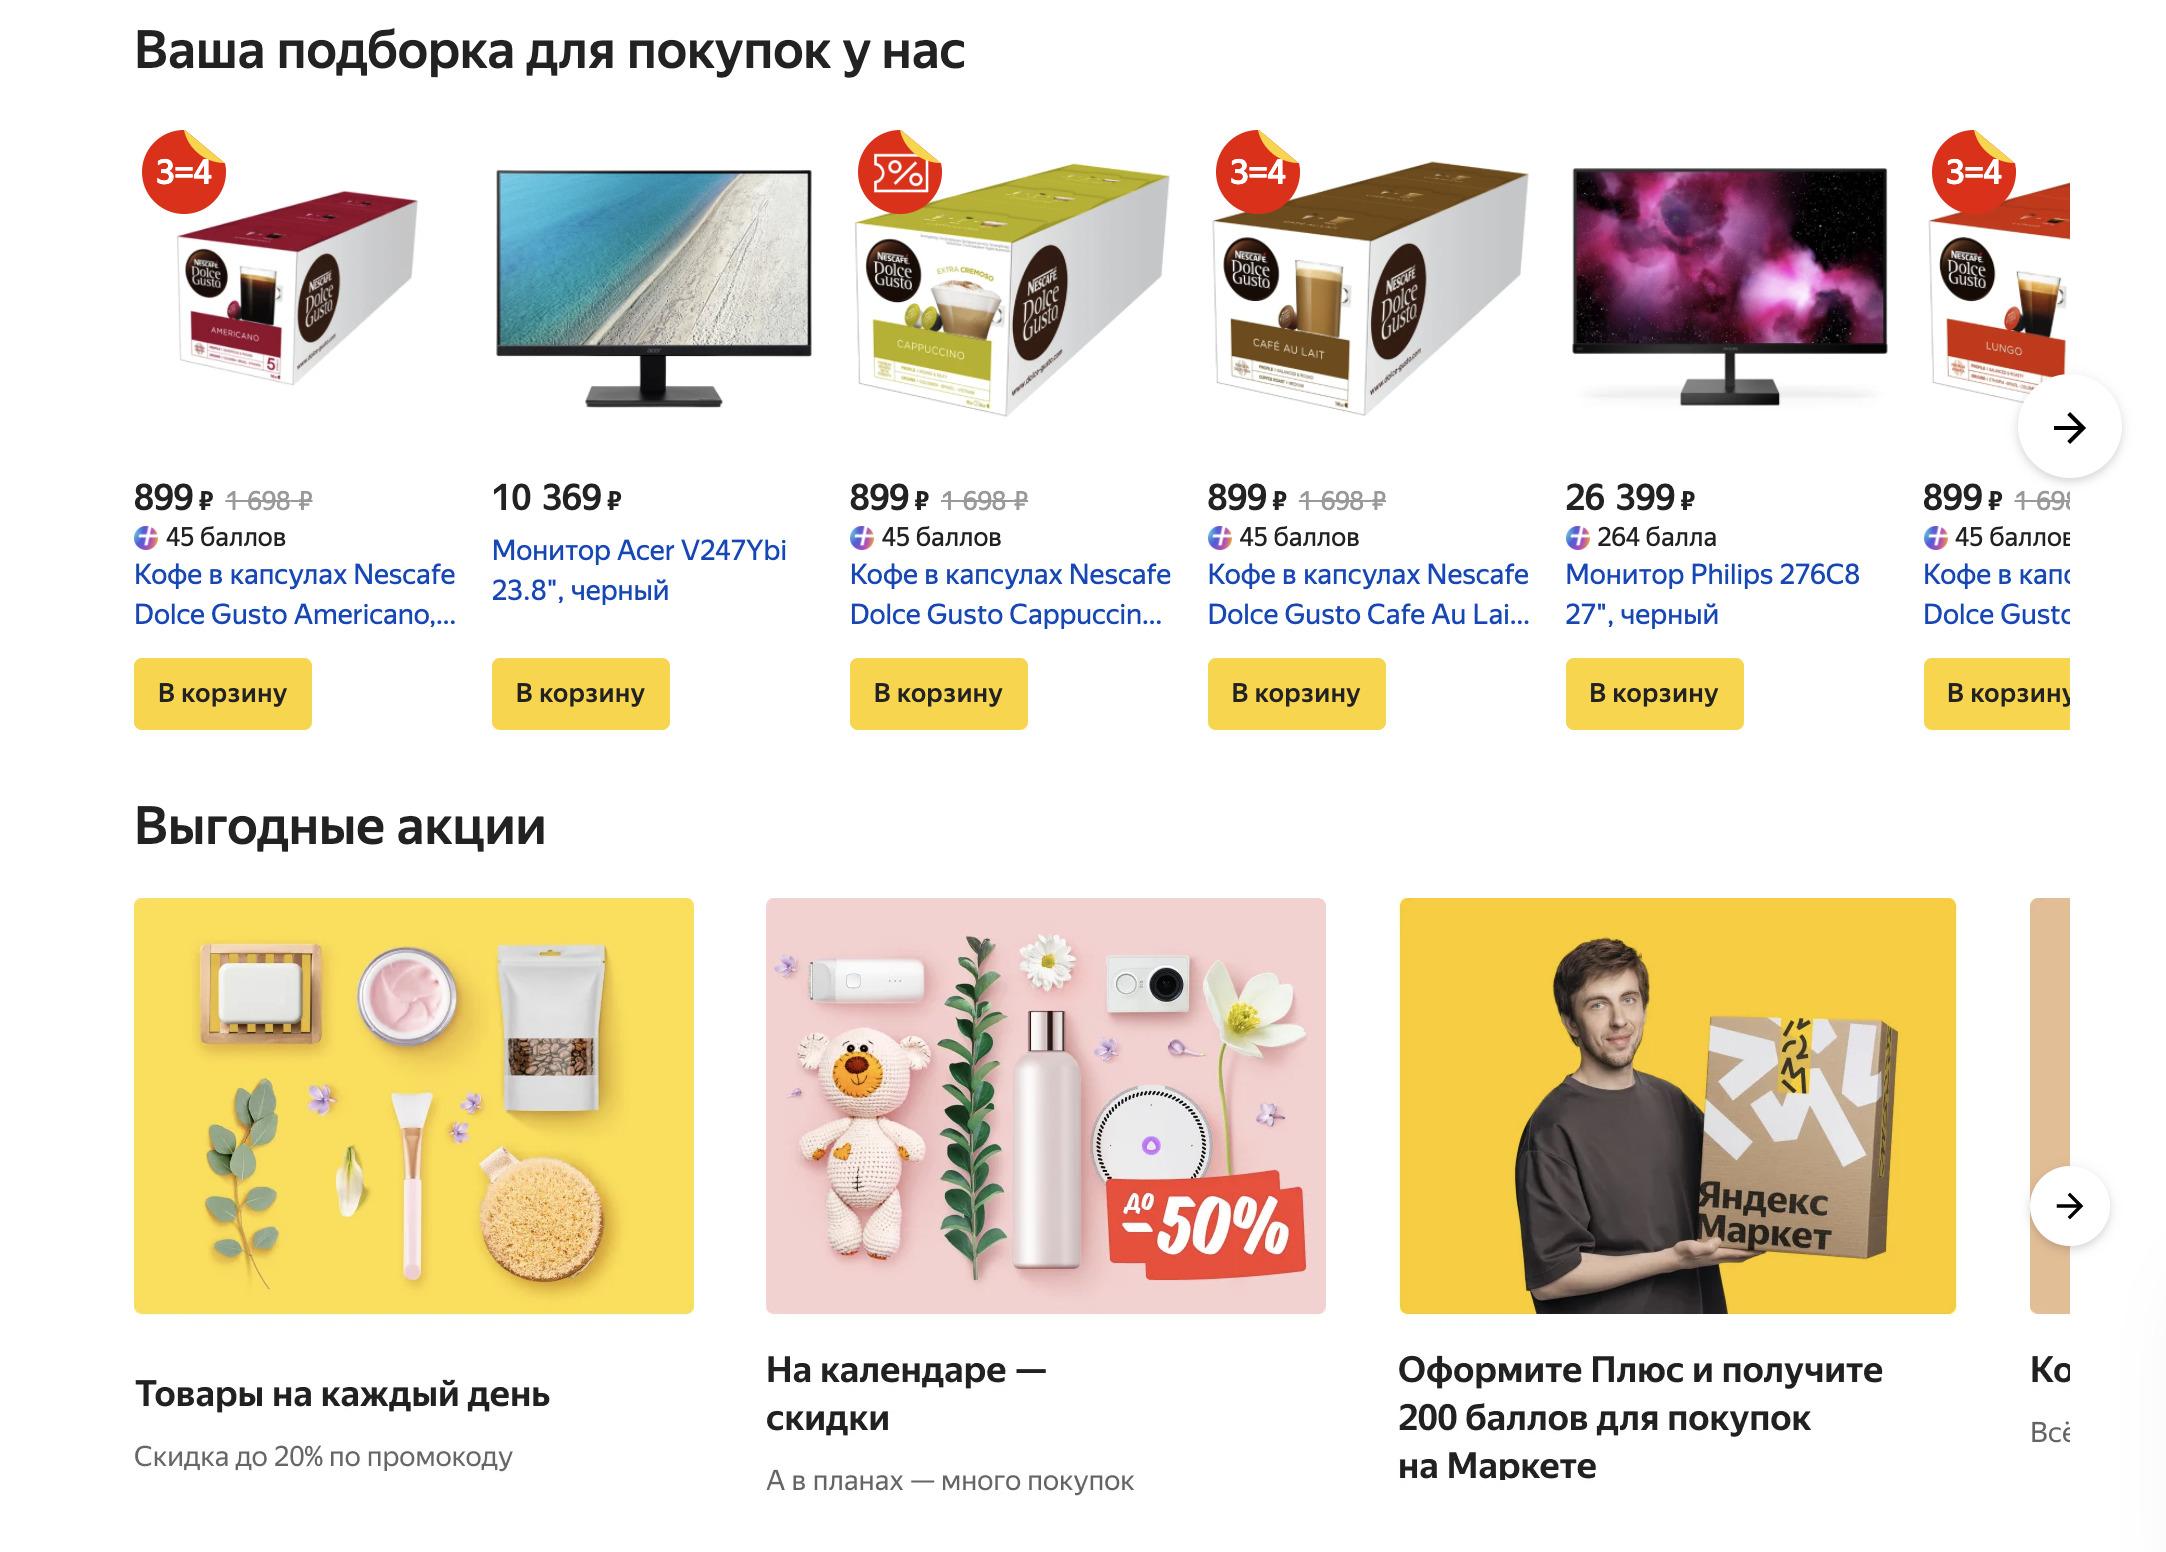 Доставка из Яндекс.Маркет в Кострома, сроки, пункты выдачи, каталог